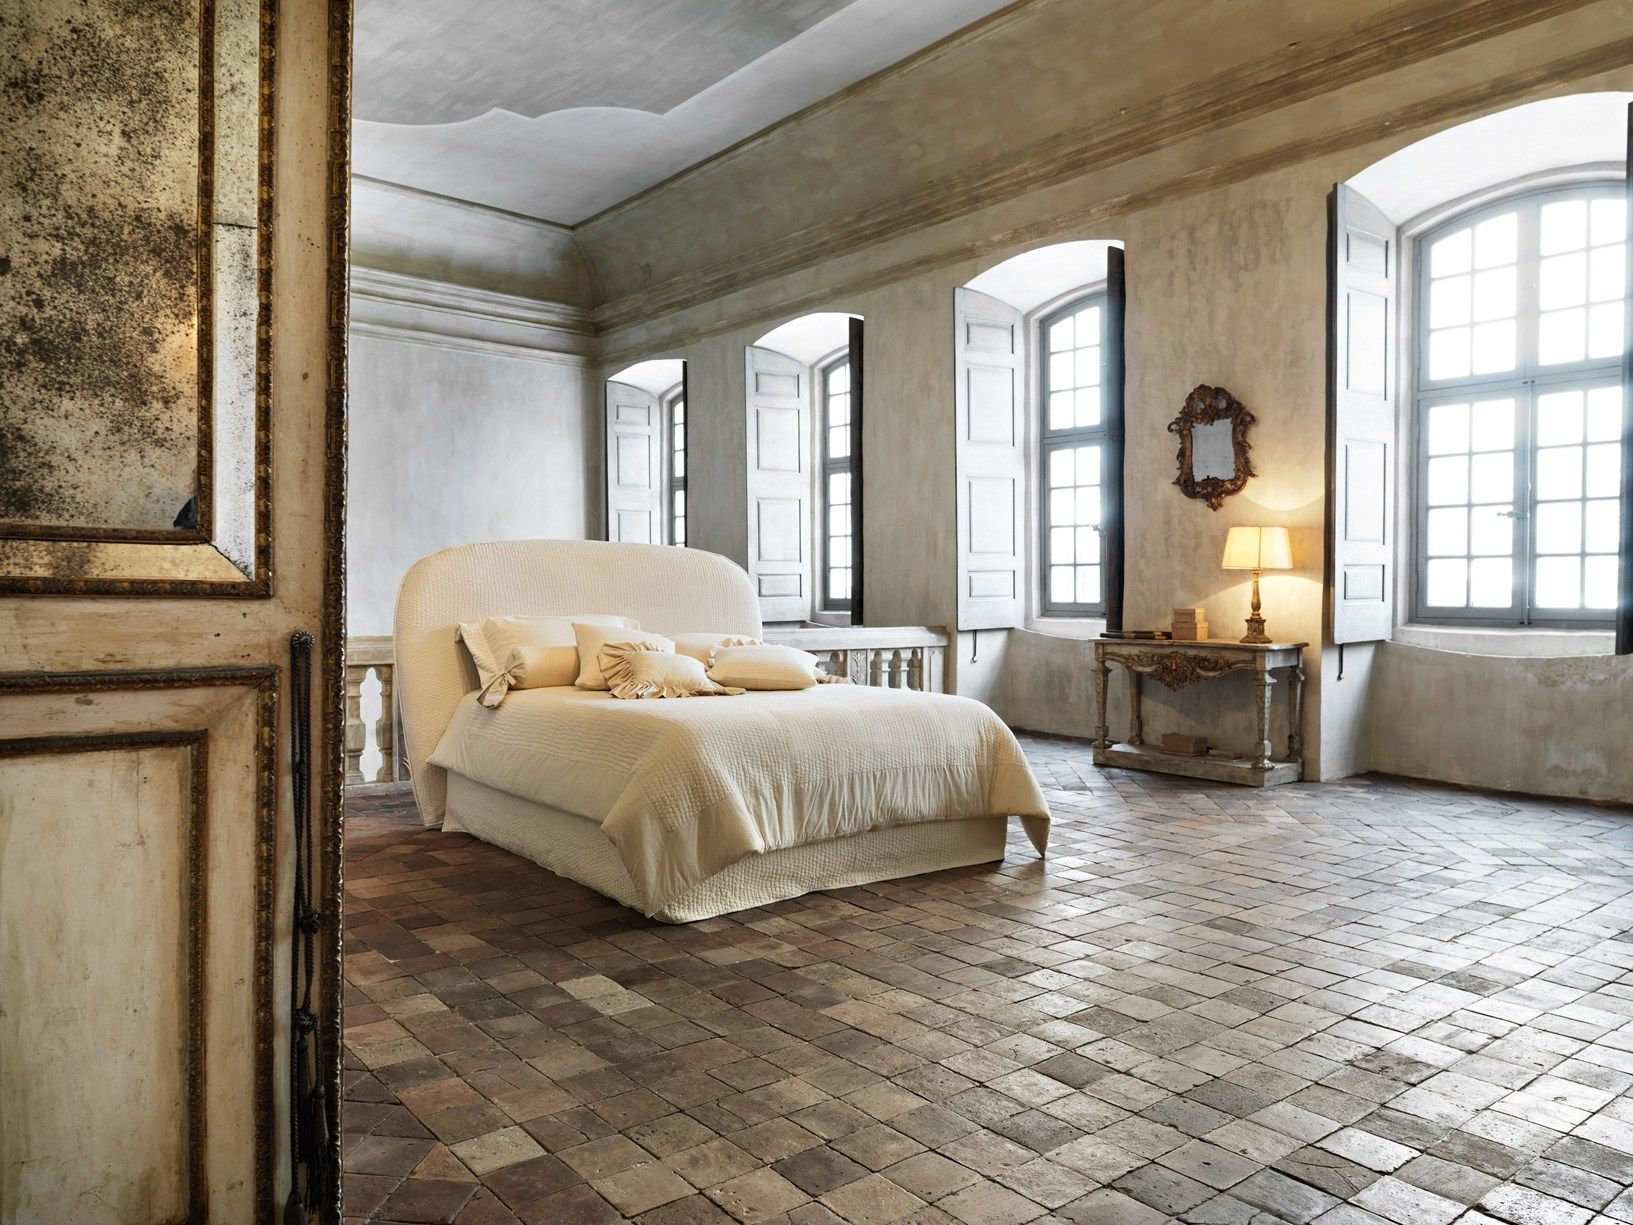 Charme francese per letti shabby chic - Camere da letto shabby moderno ...